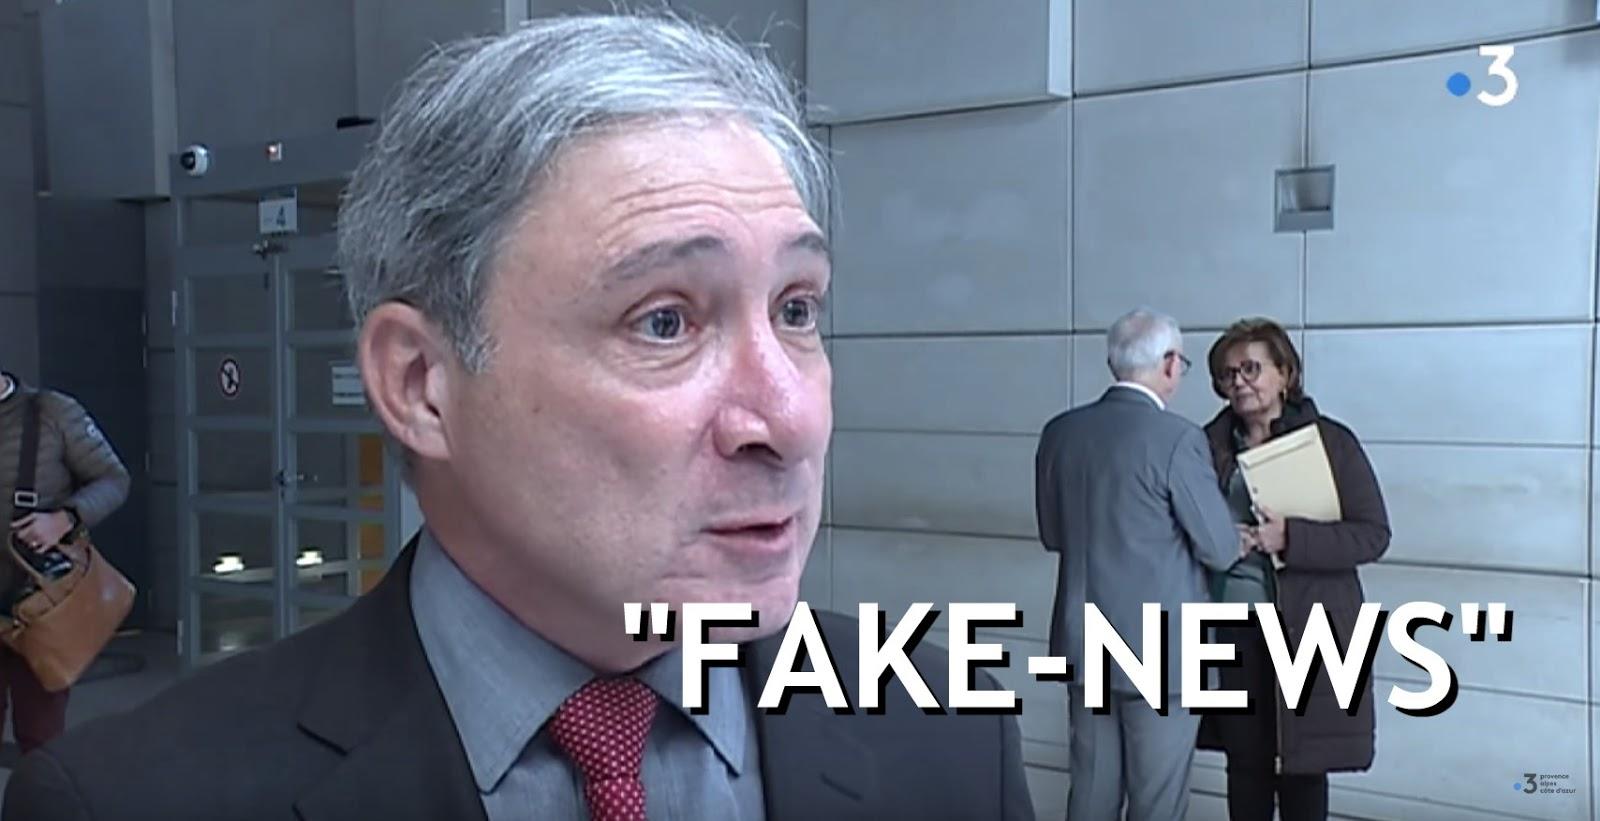 """La presse est manipulée"" affirme le procureur de Nice"